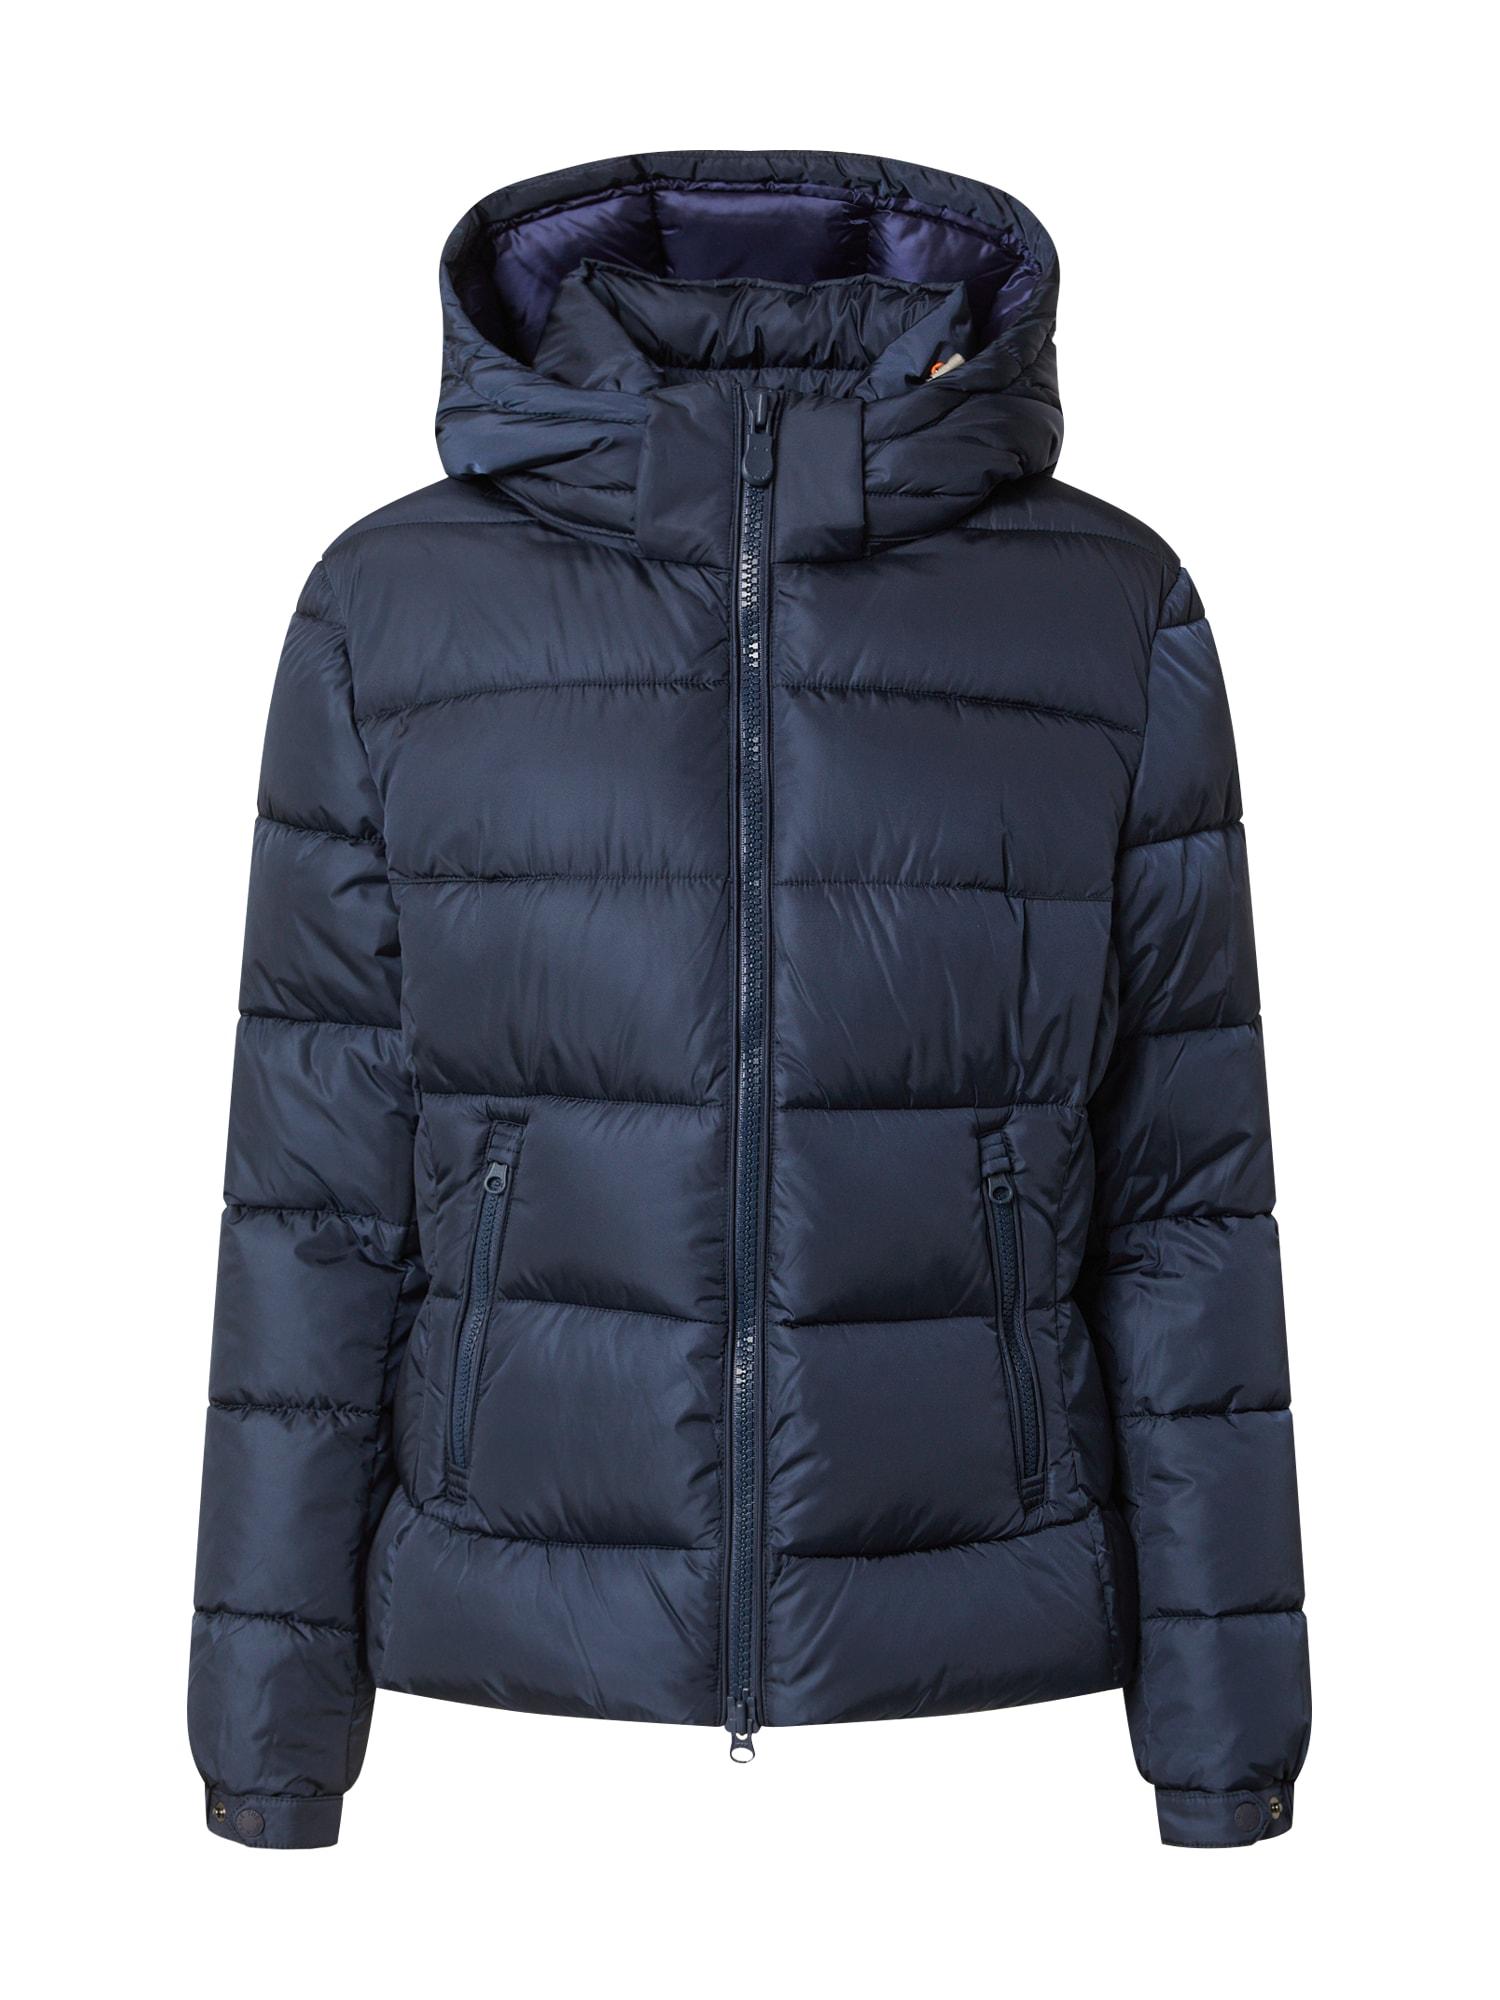 SAVE THE DUCK Zimná bunda 'Megay'  námornícka modrá